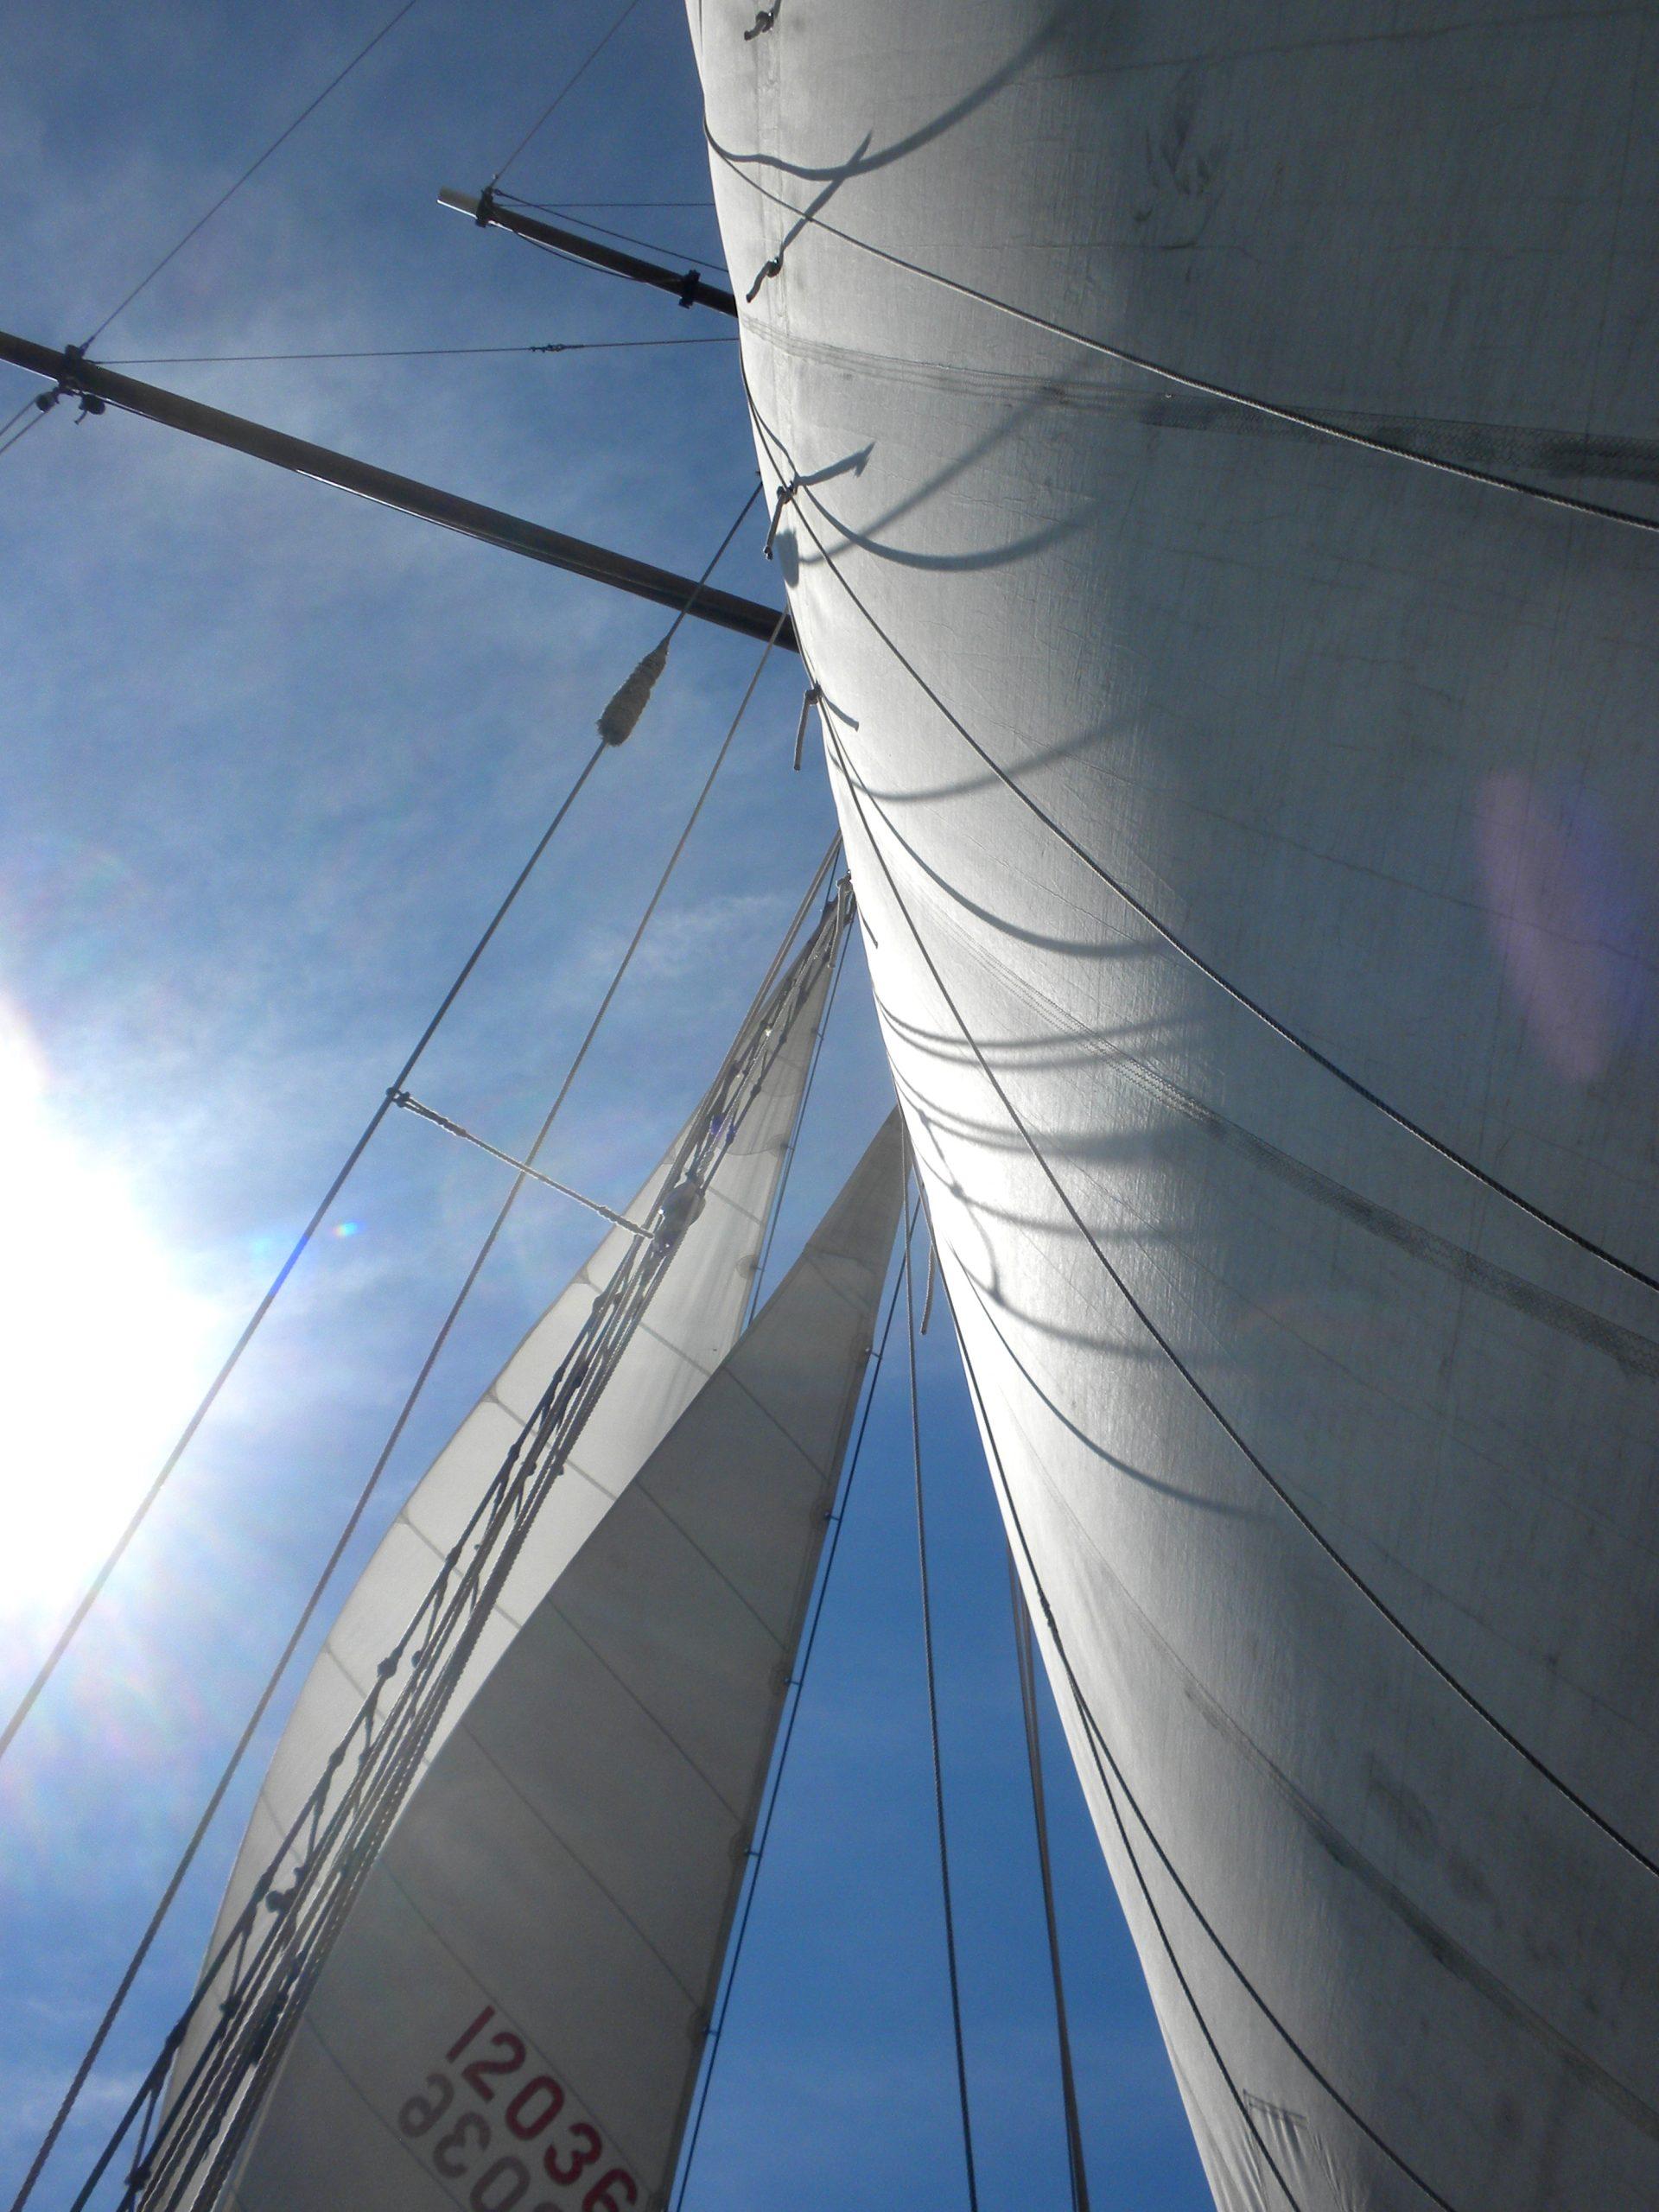 2013, New York Harbor, New York, New York